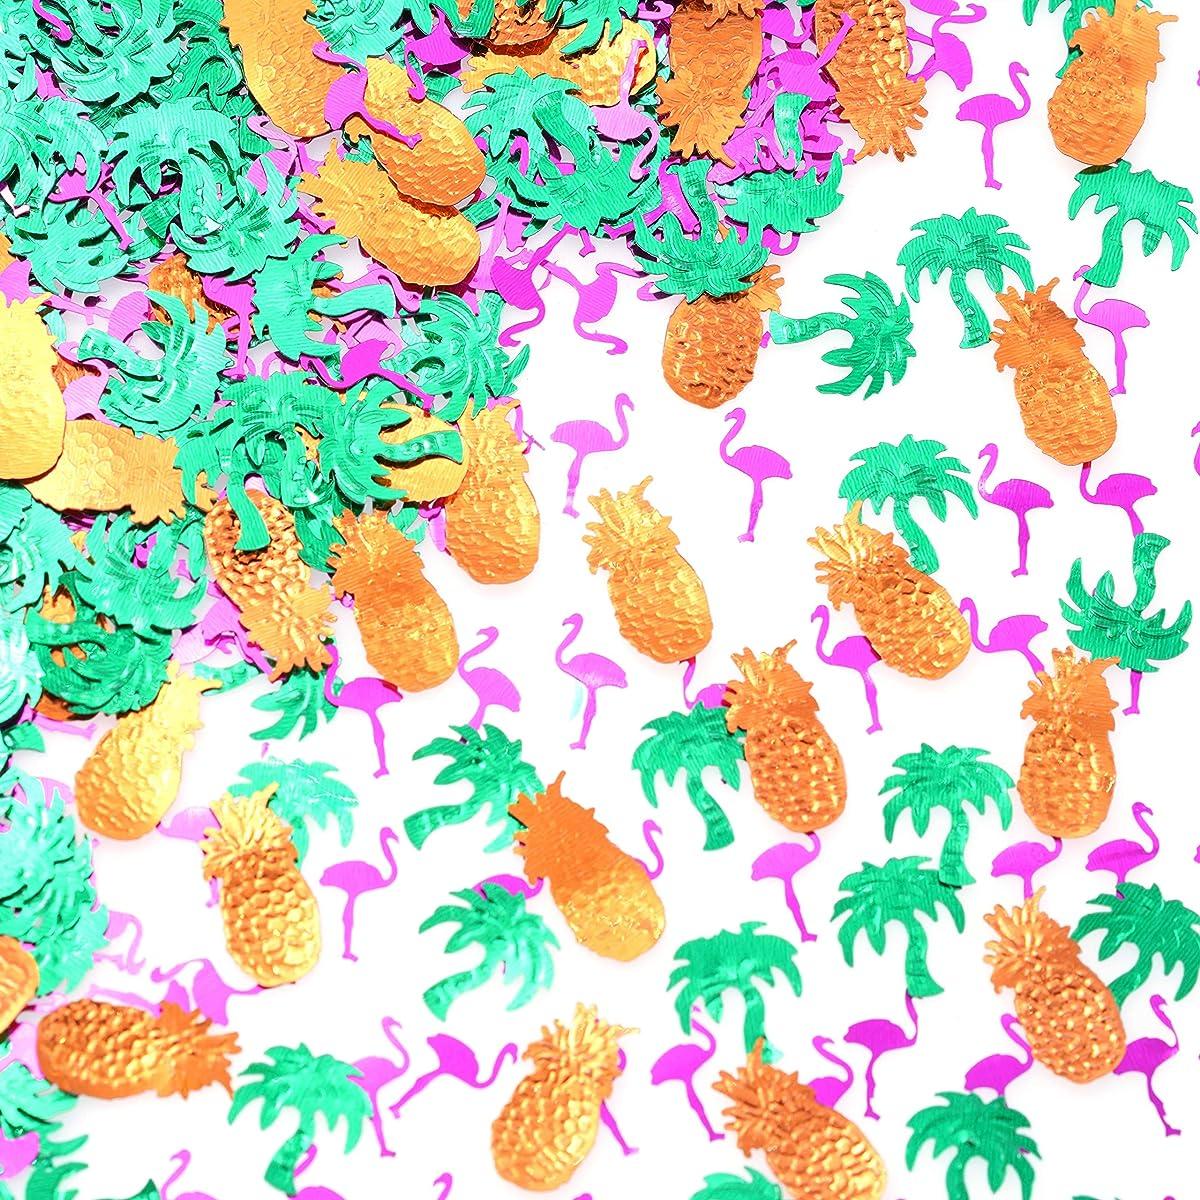 Summer Hawaiian Flamingo Party Confetti - Foil Metallic Sequins Table Confetti Tropical Jungle Safari 1st Birthday Baby Shower Wedding Party Sprinkles Confetti Decorations, 60g